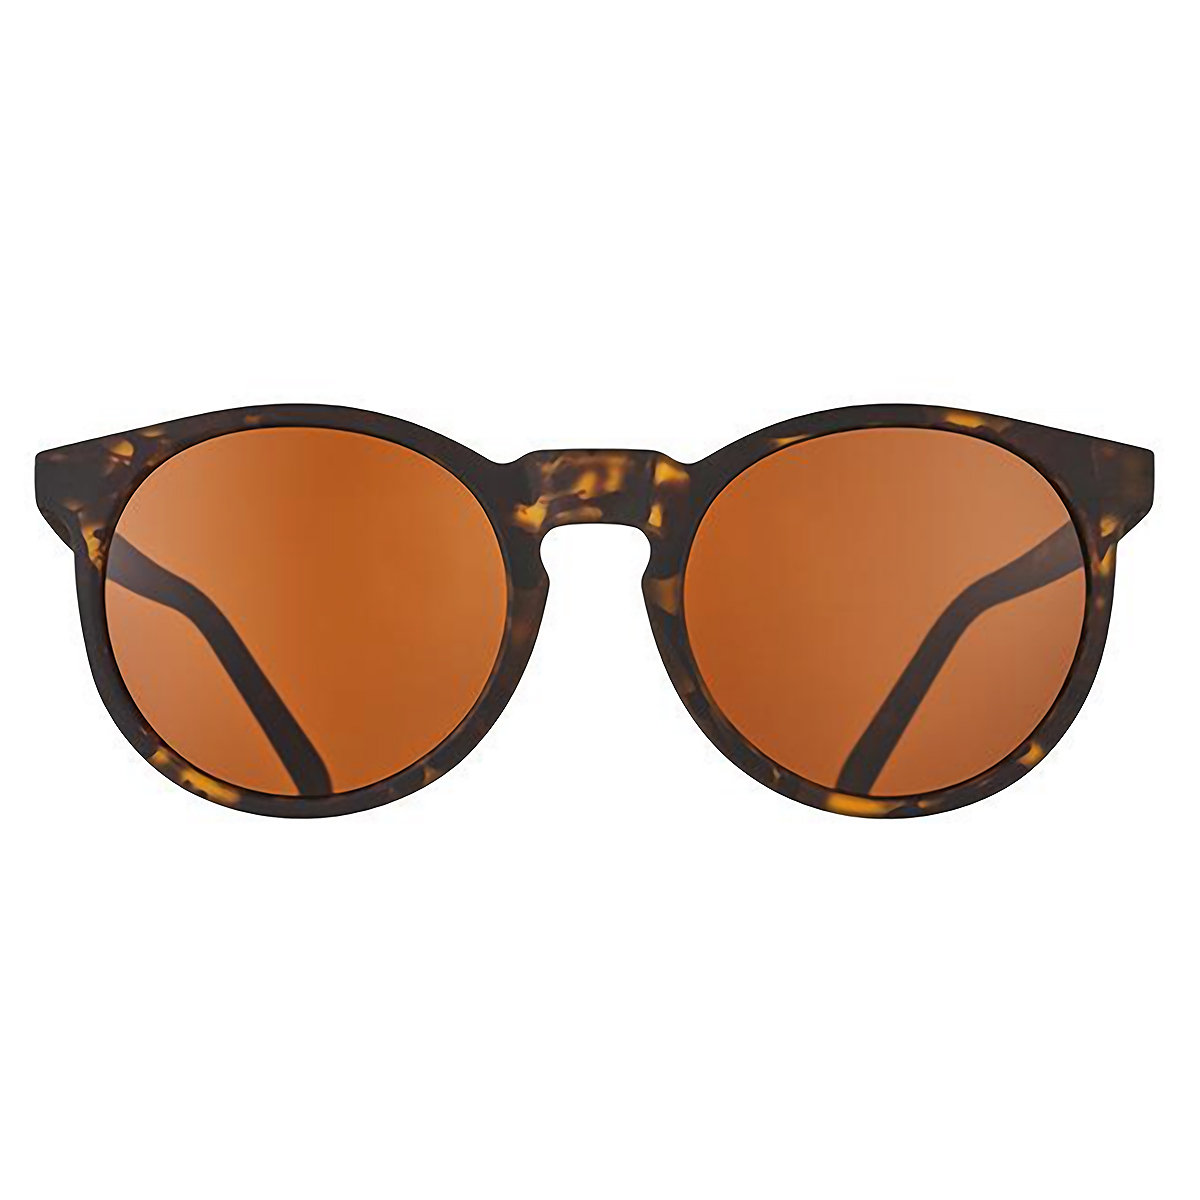 Goodr Nine Dollar Pour Over Sunglasses - Color: Tortoise - Size: OS, Tortoise, large, image 2